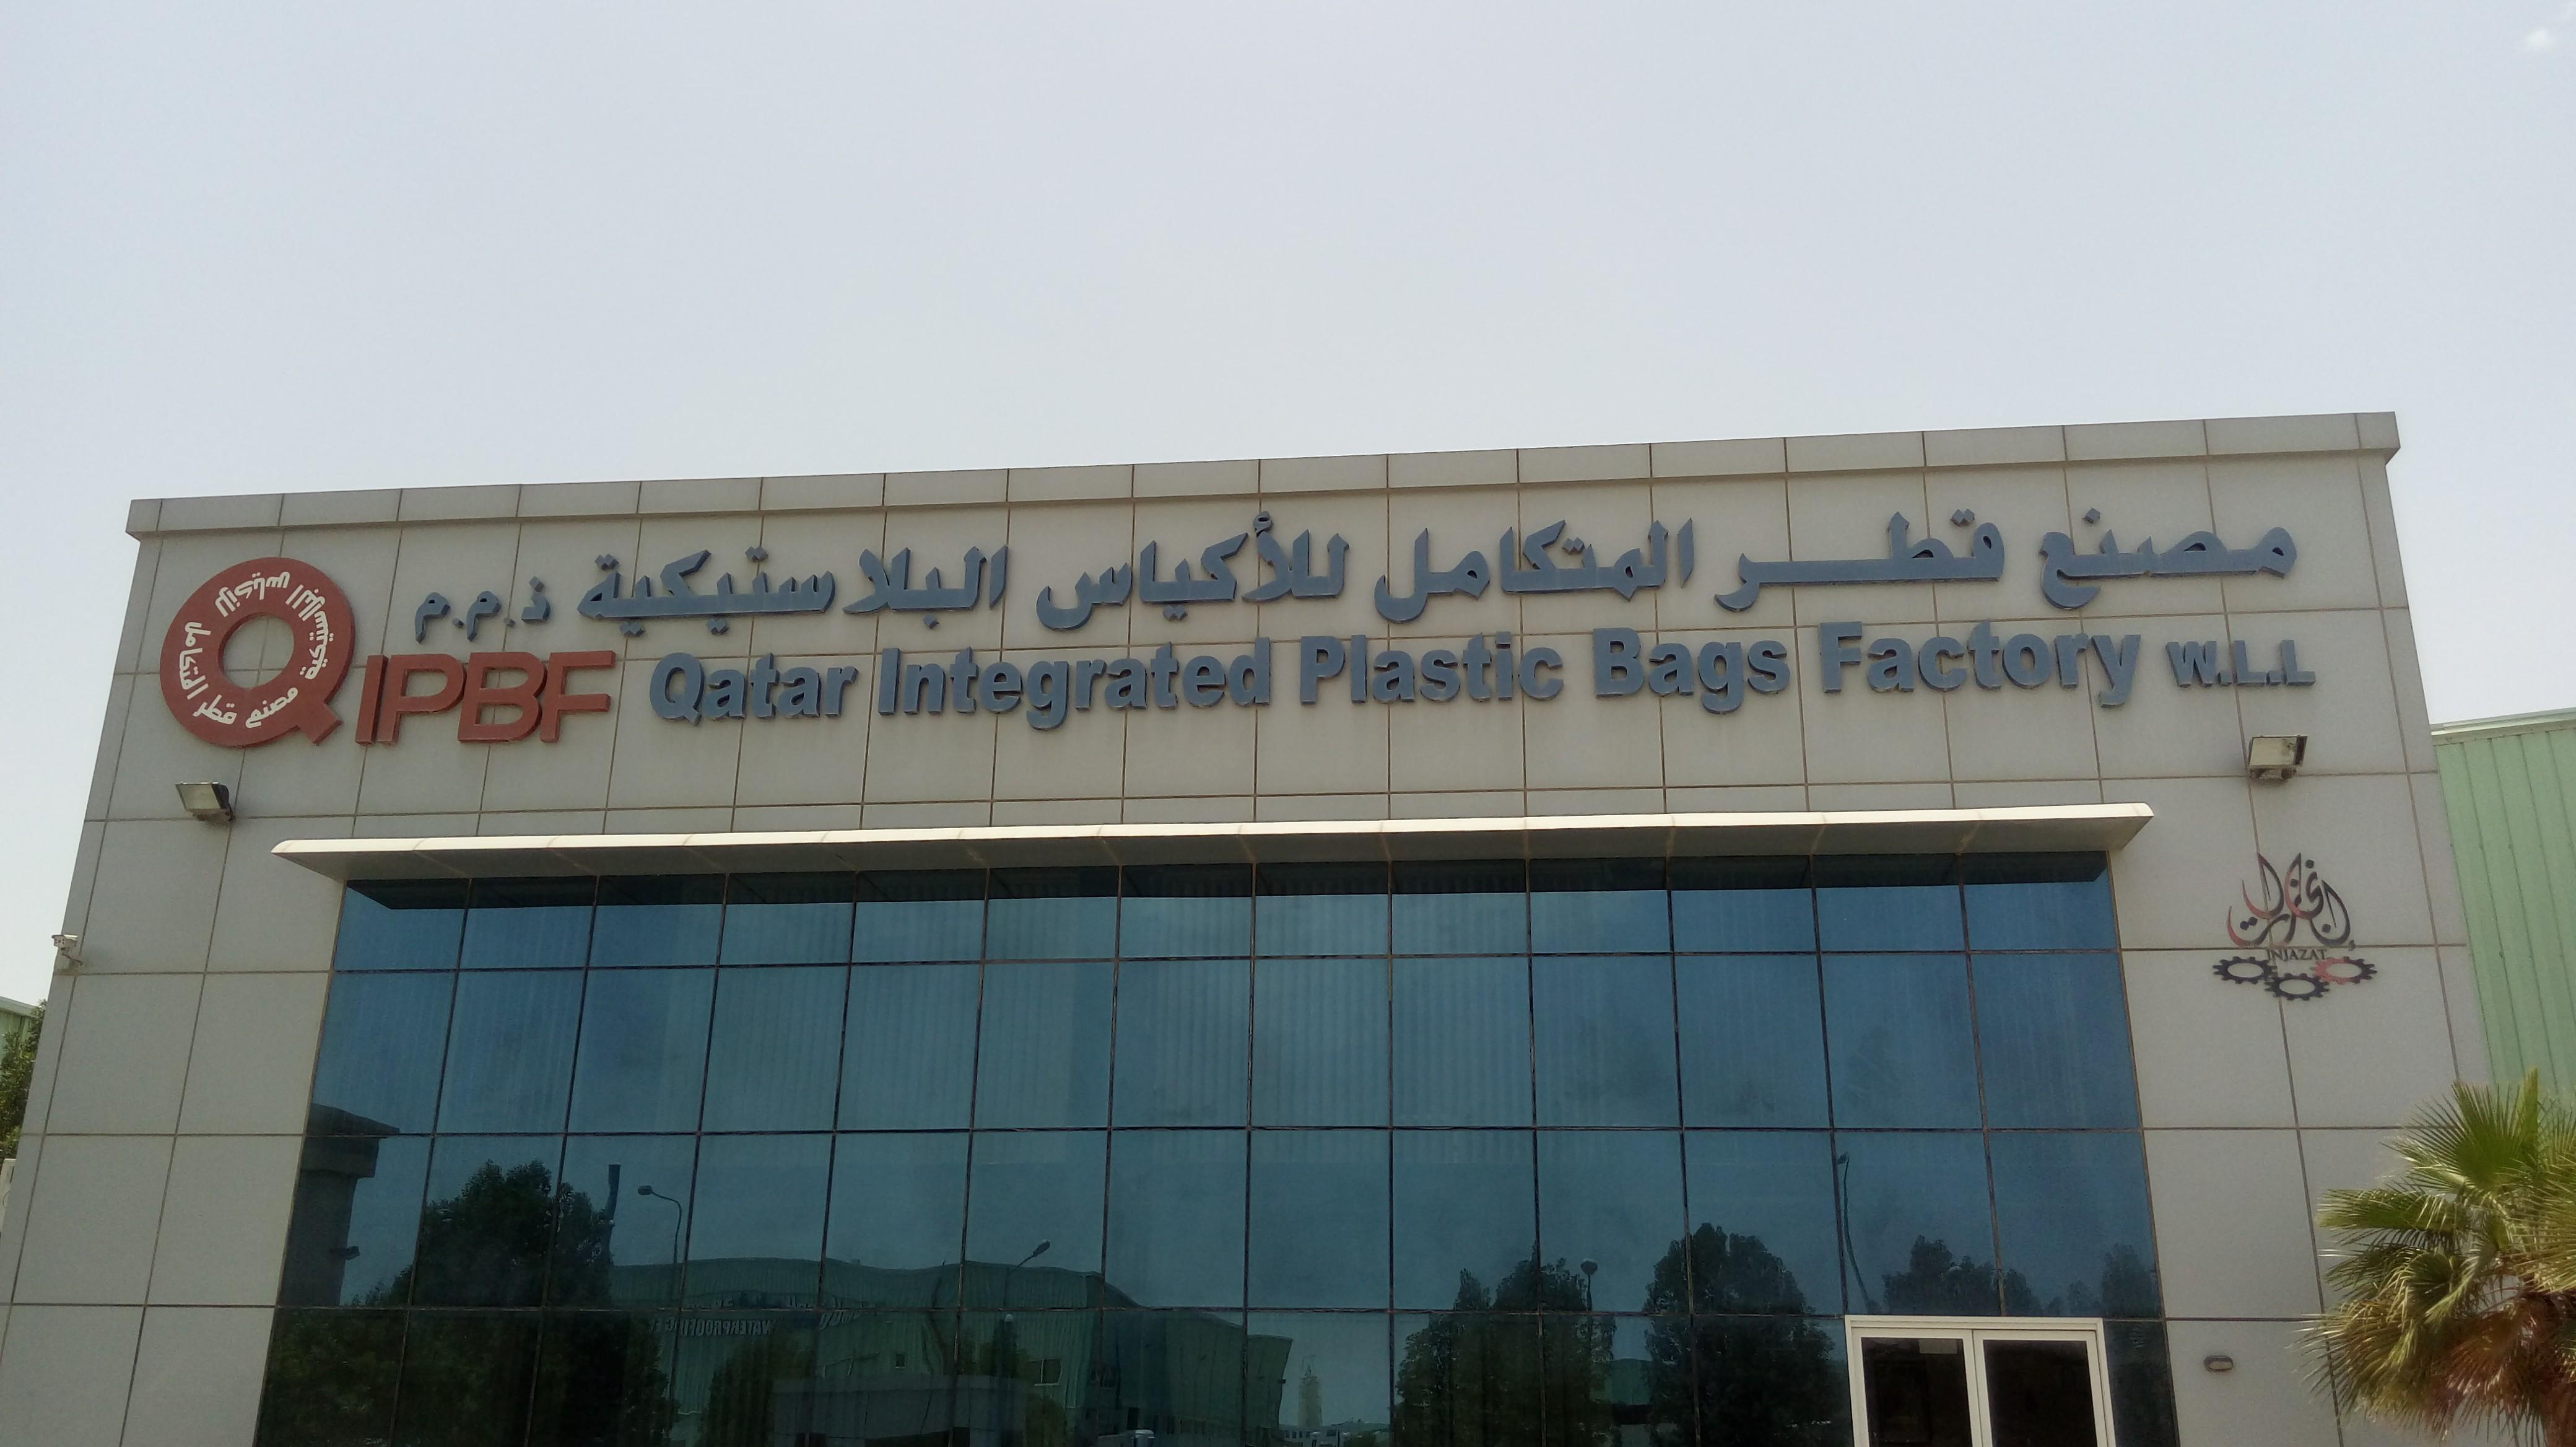 Qatar Integrated Plastic Bags Factory   LinkedIn